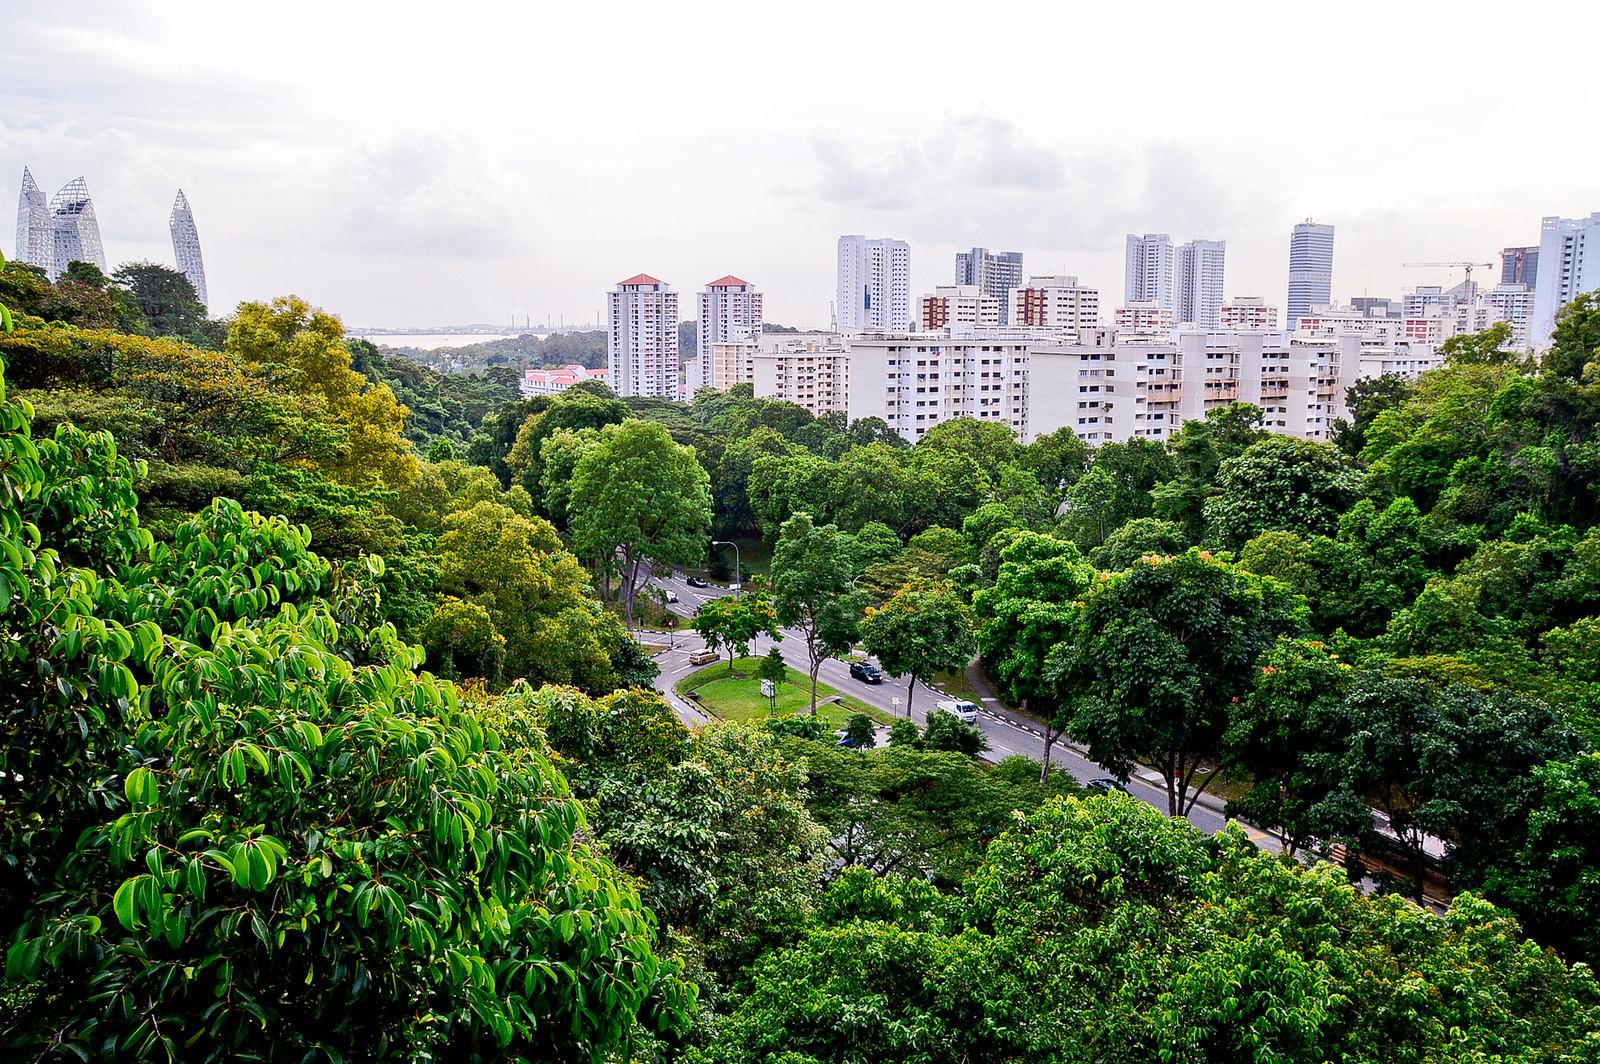 Mount Faber, Singapore 2016